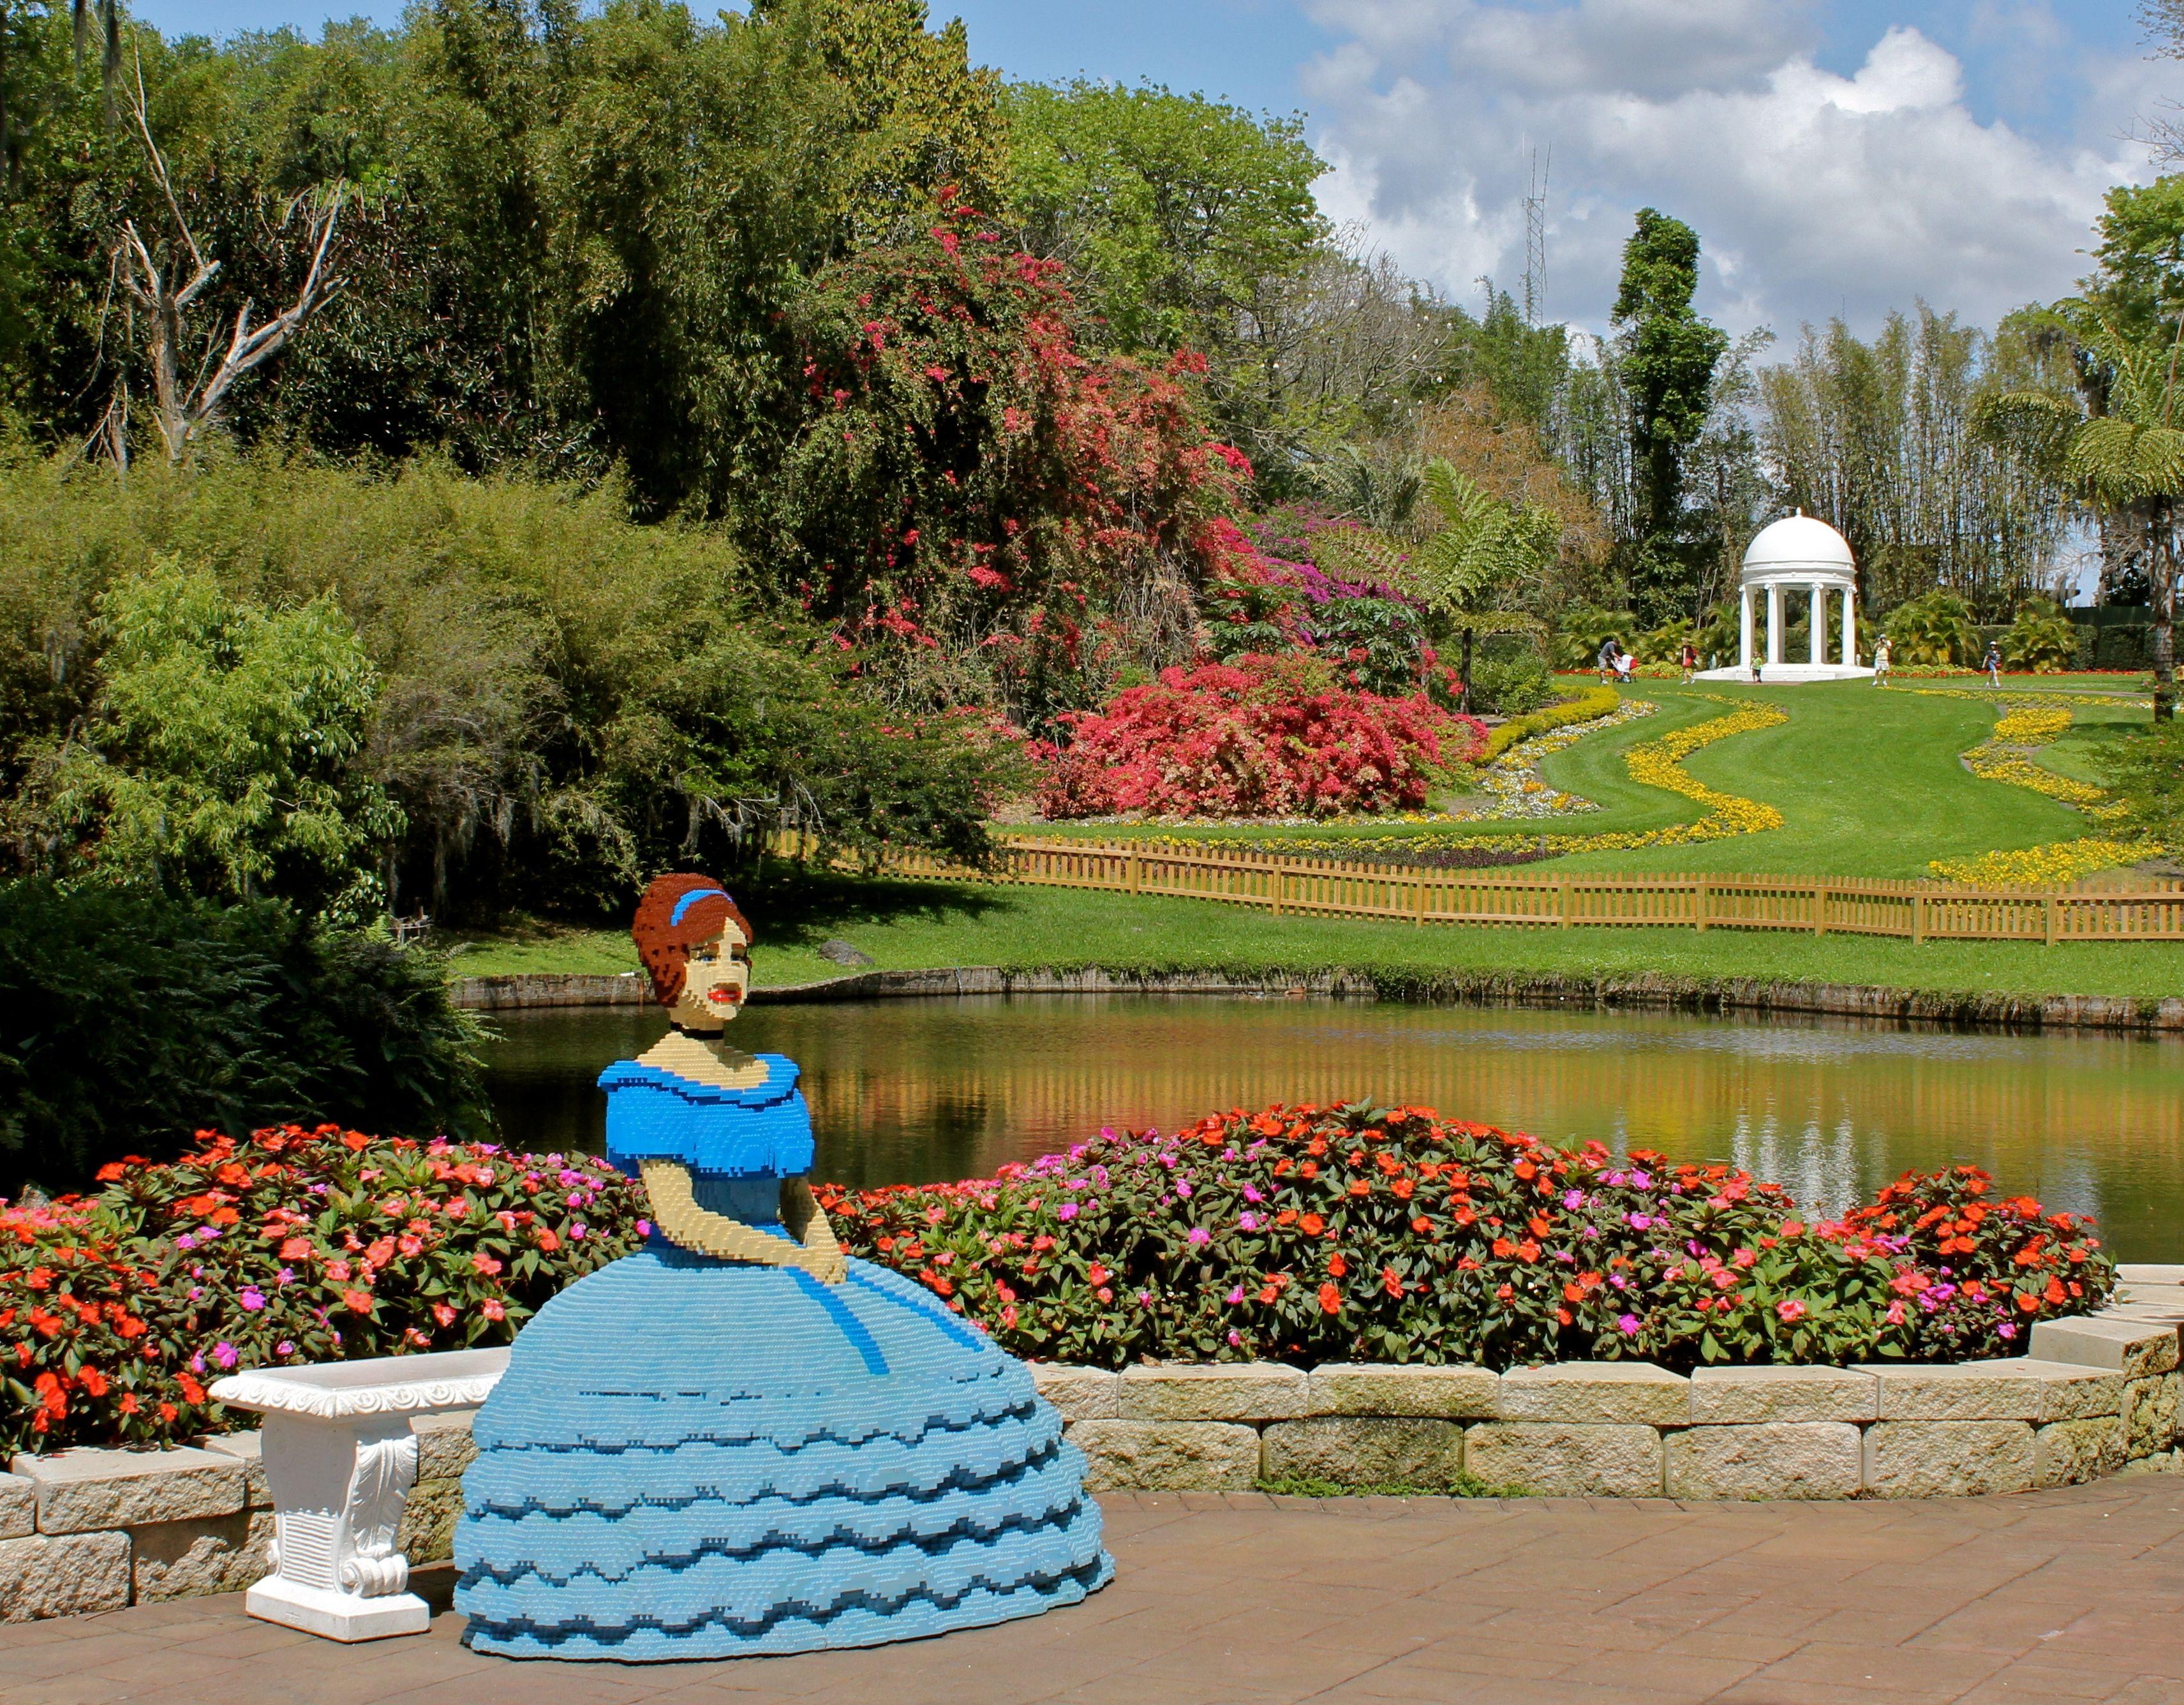 45245497ad1d0cb43a44d41cc262d1c7 - Cypress Gardens Adventure Park Winter Haven Fl